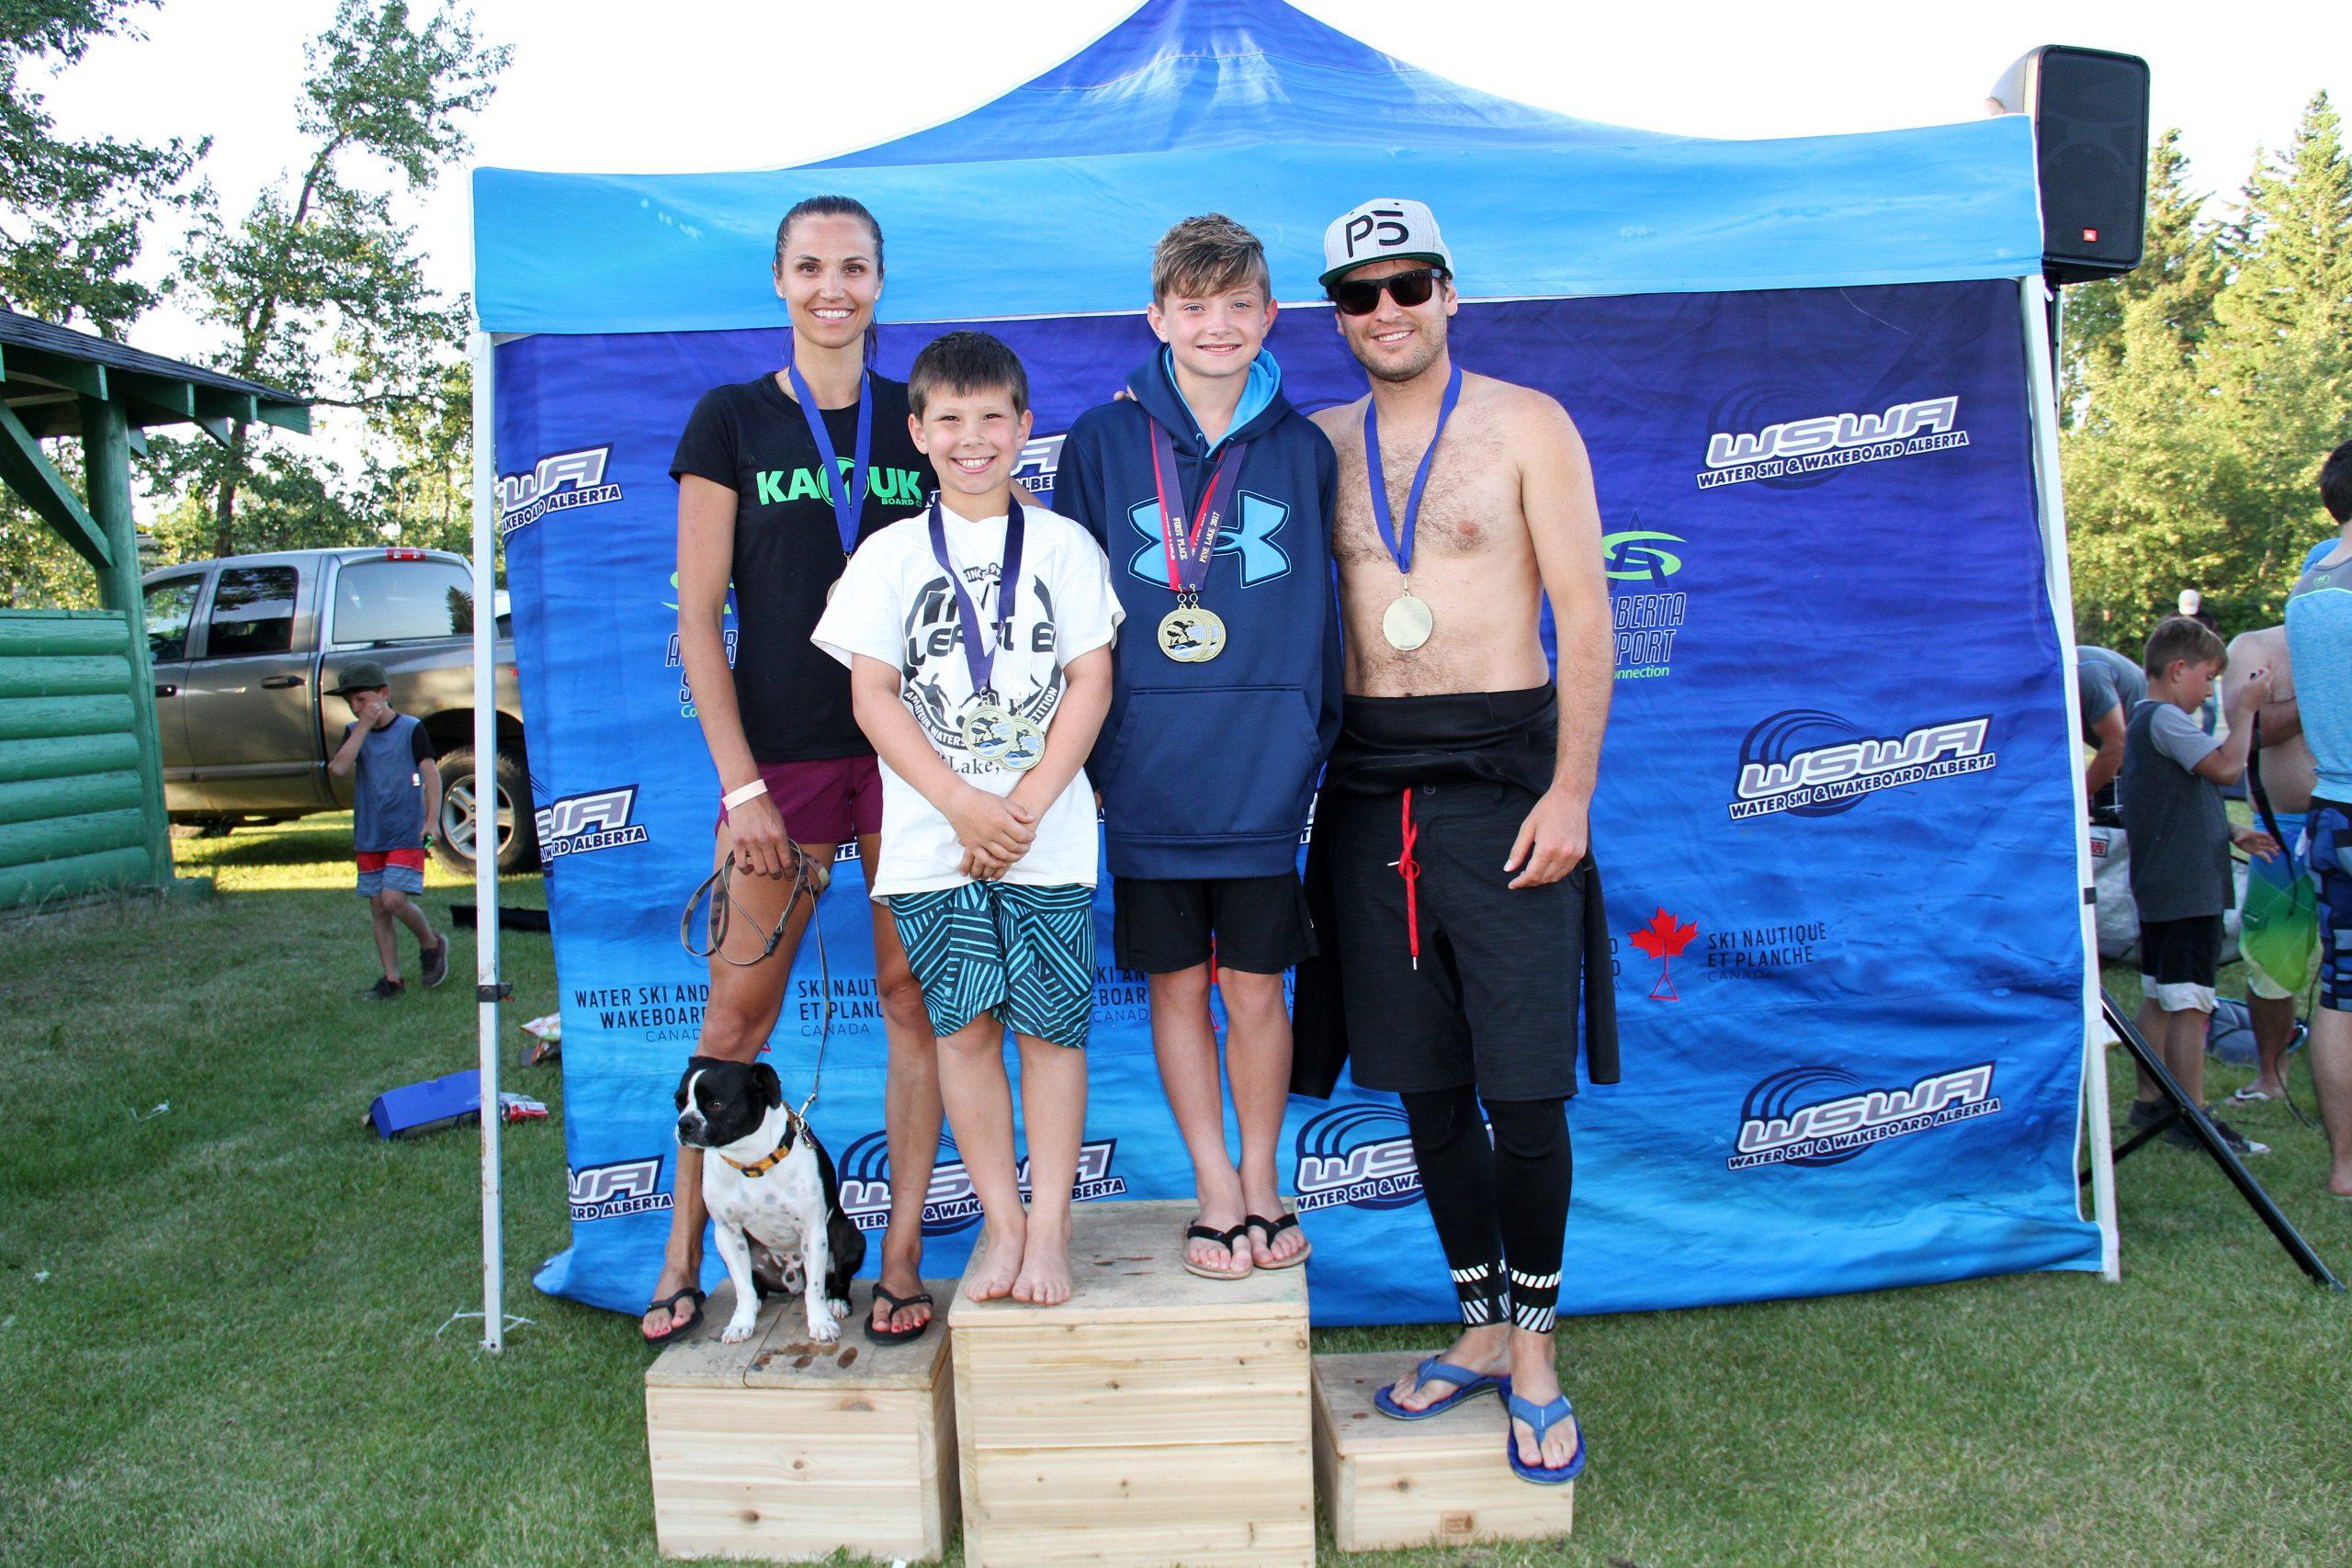 Podium finishes for EK wakeboarders in Alberta